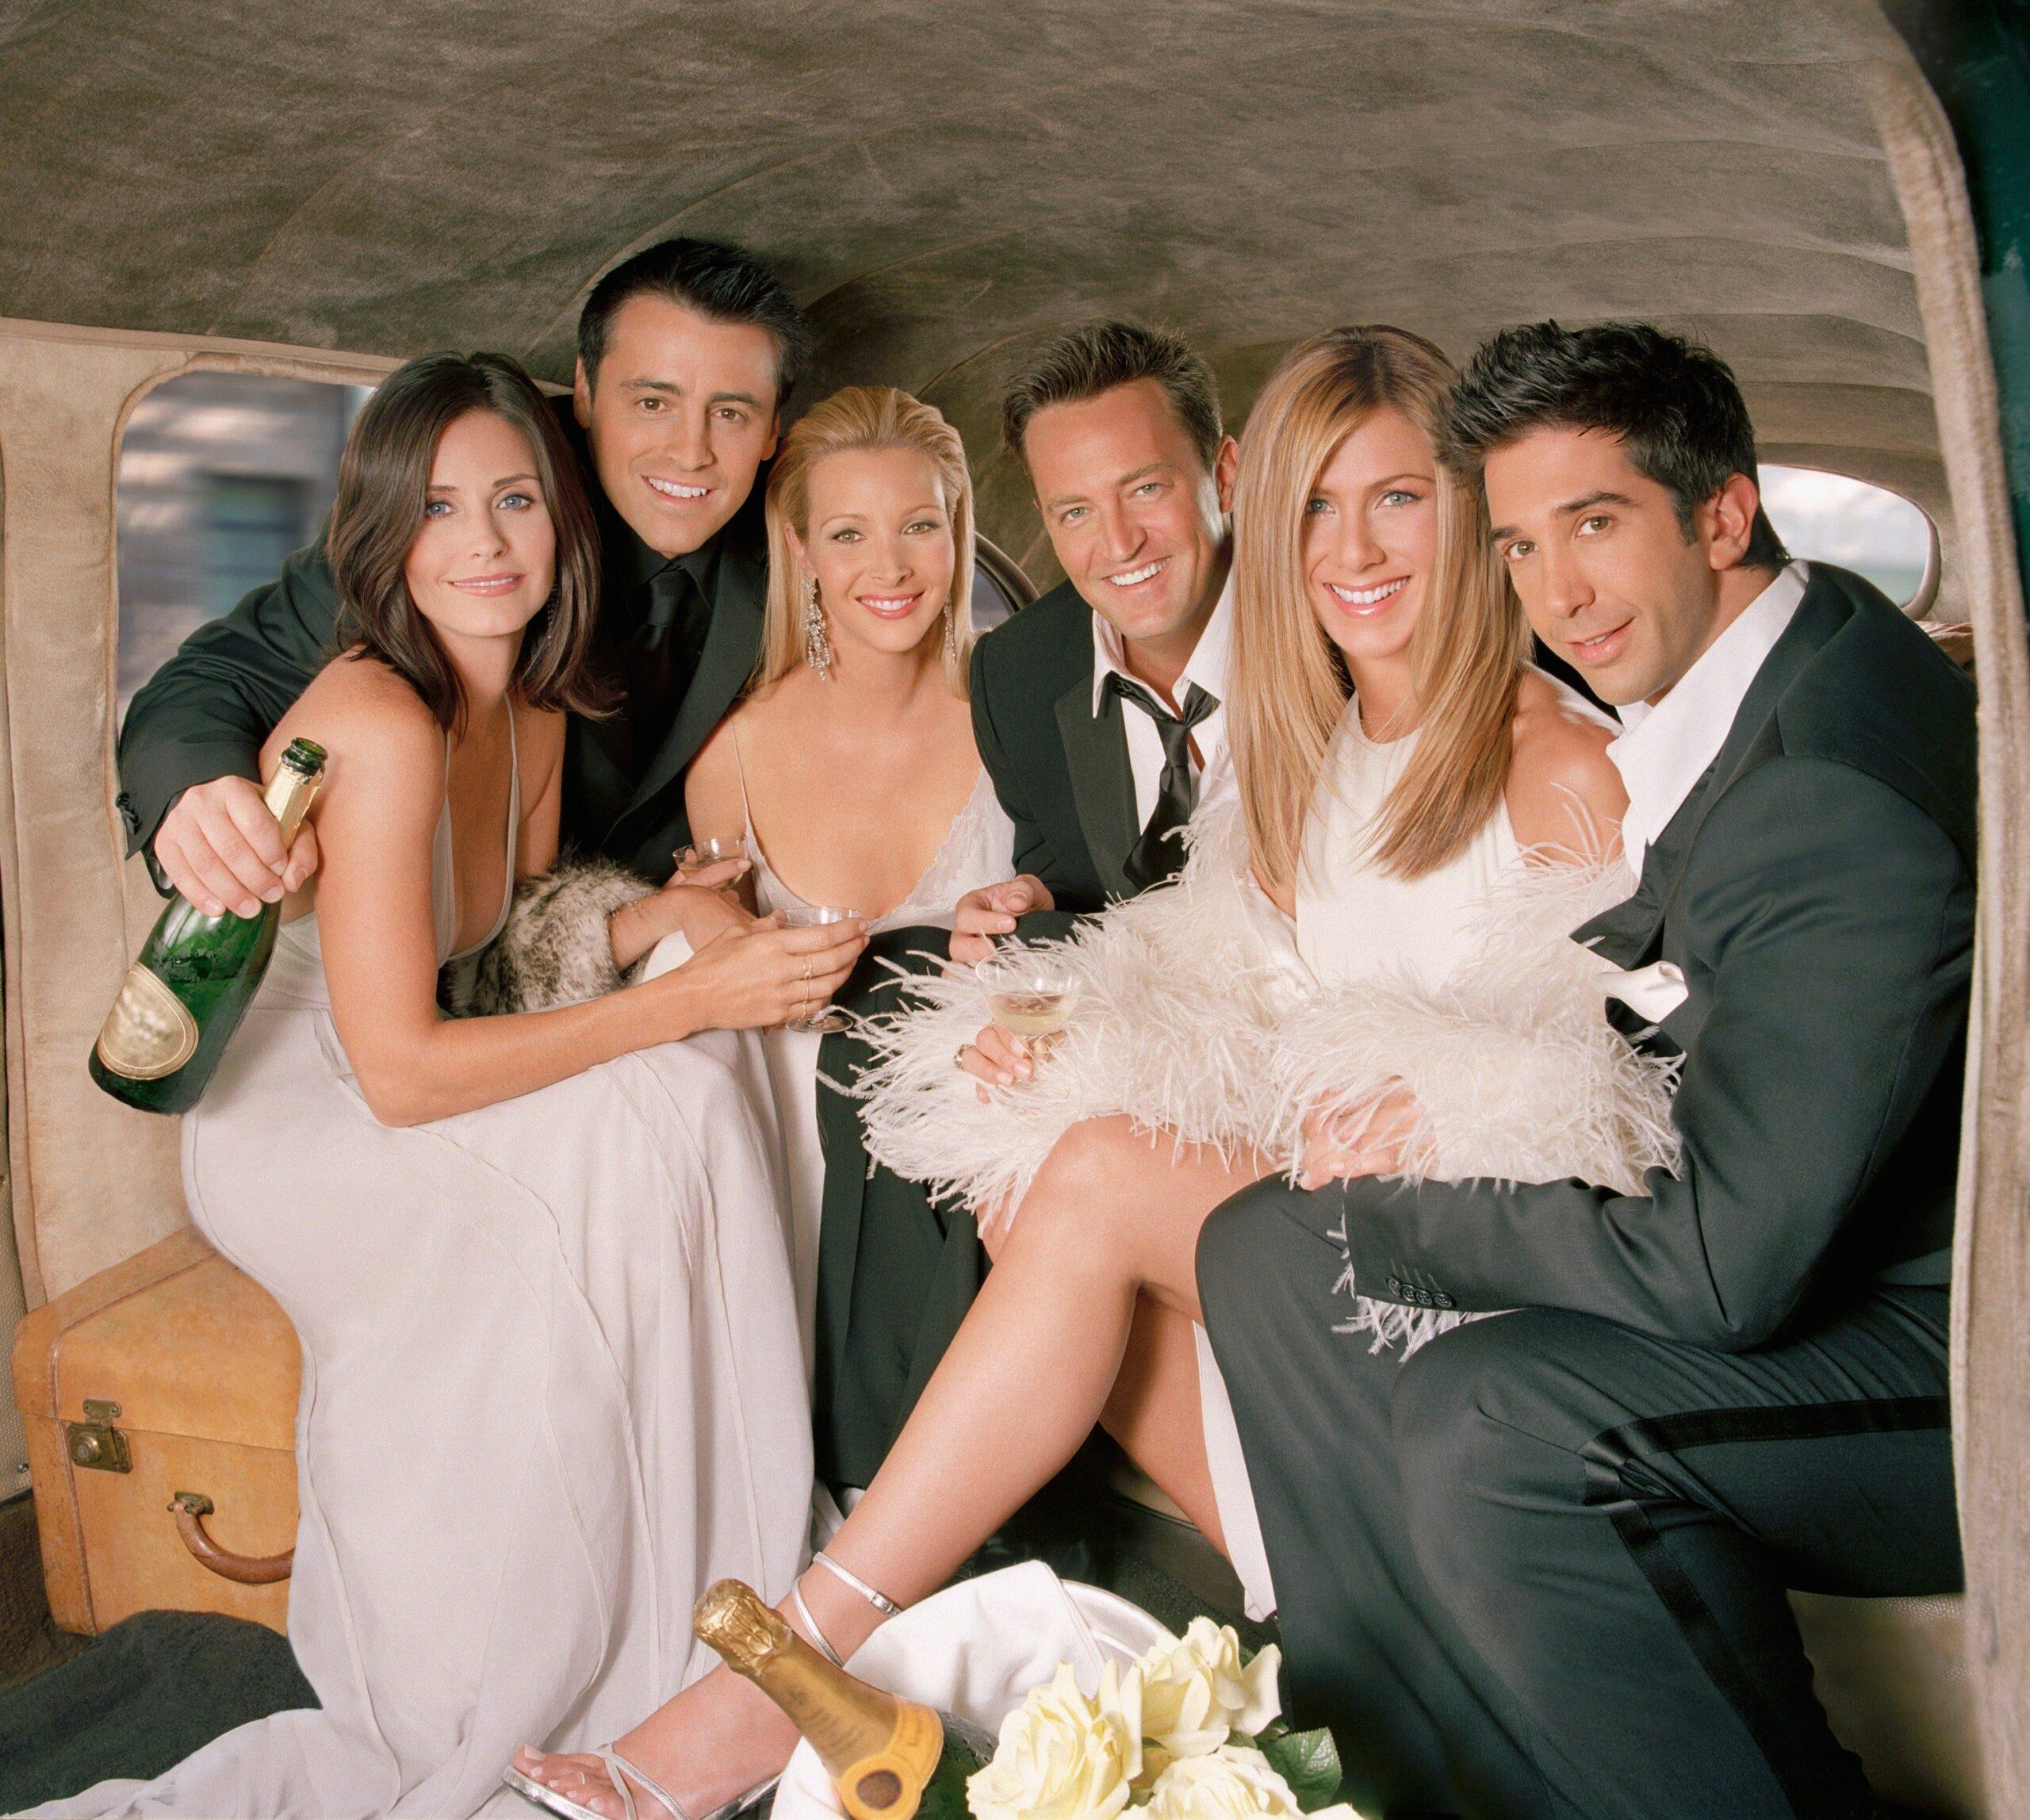 Long awaited Friends reunion to finally hit the screens: David Schwimmer confirms